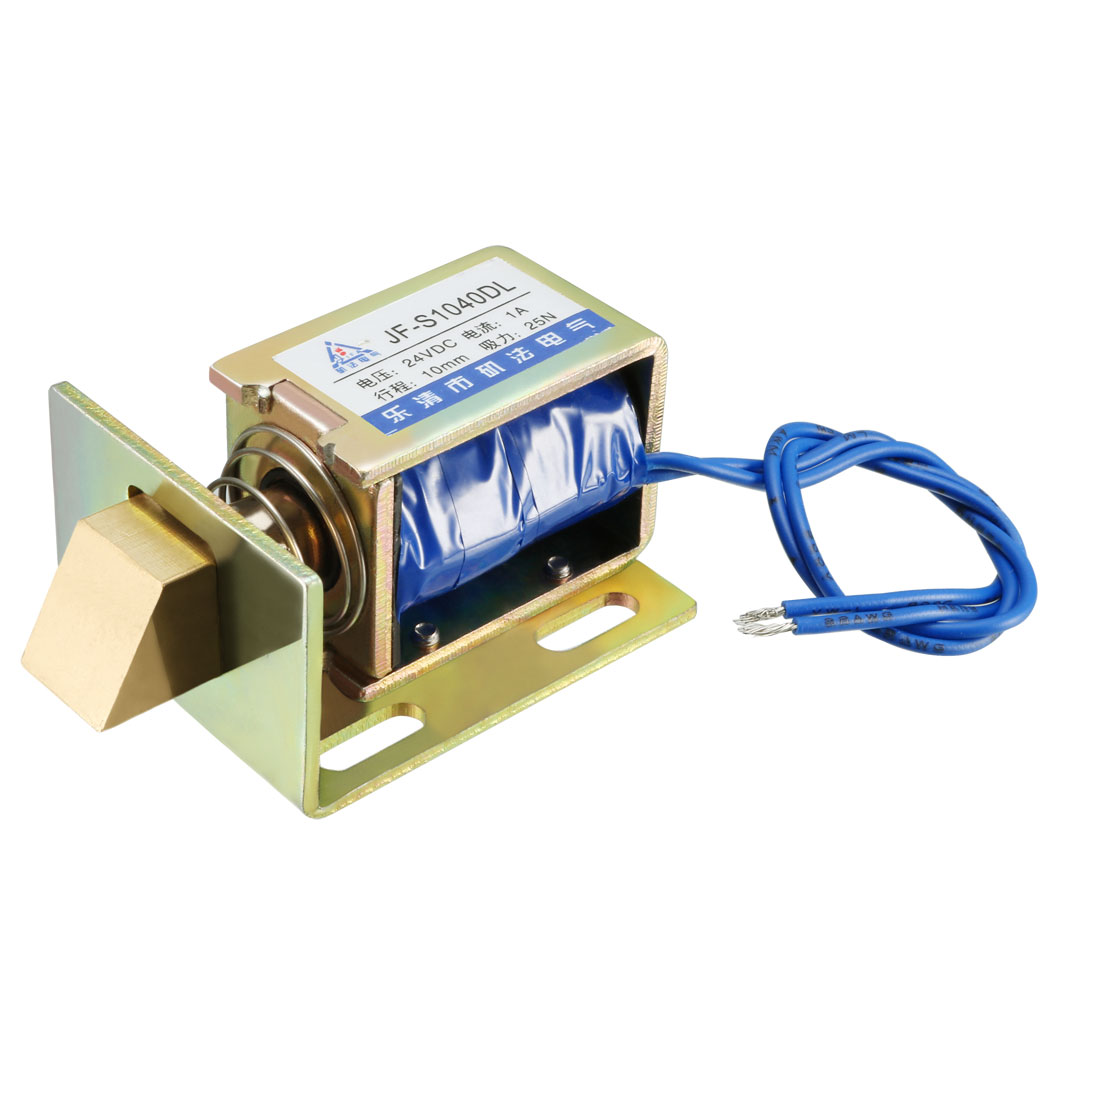 Uxcell JF-S1040DL DC 24V 1A 25N 10mm Pull Type Open FrameLinear Motion Solenoid Electromagnet